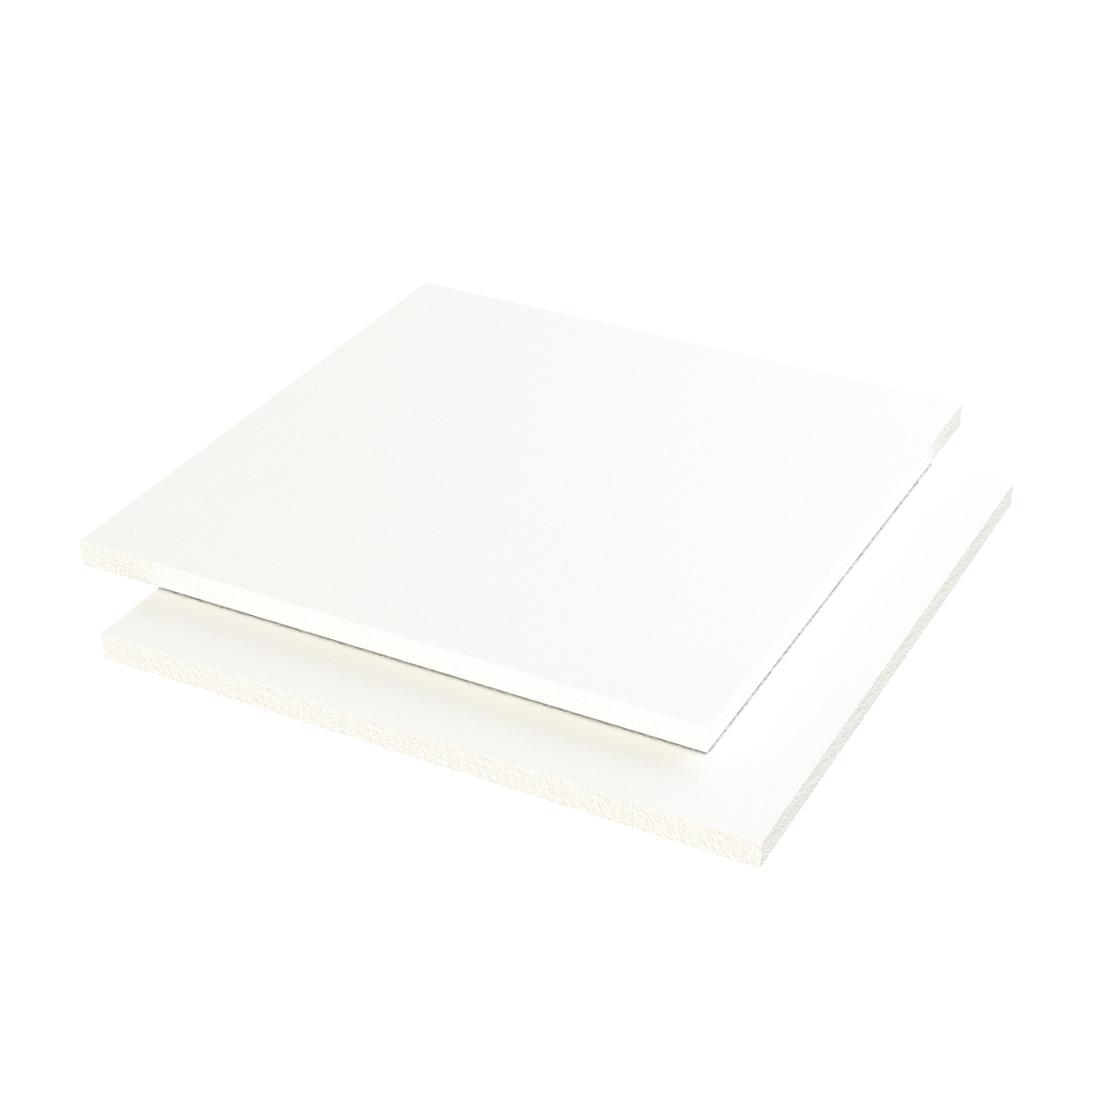 Vikupor J PVC Plaat Geschuimd Wit Enkelzijdig folie 4050x2050x10mm